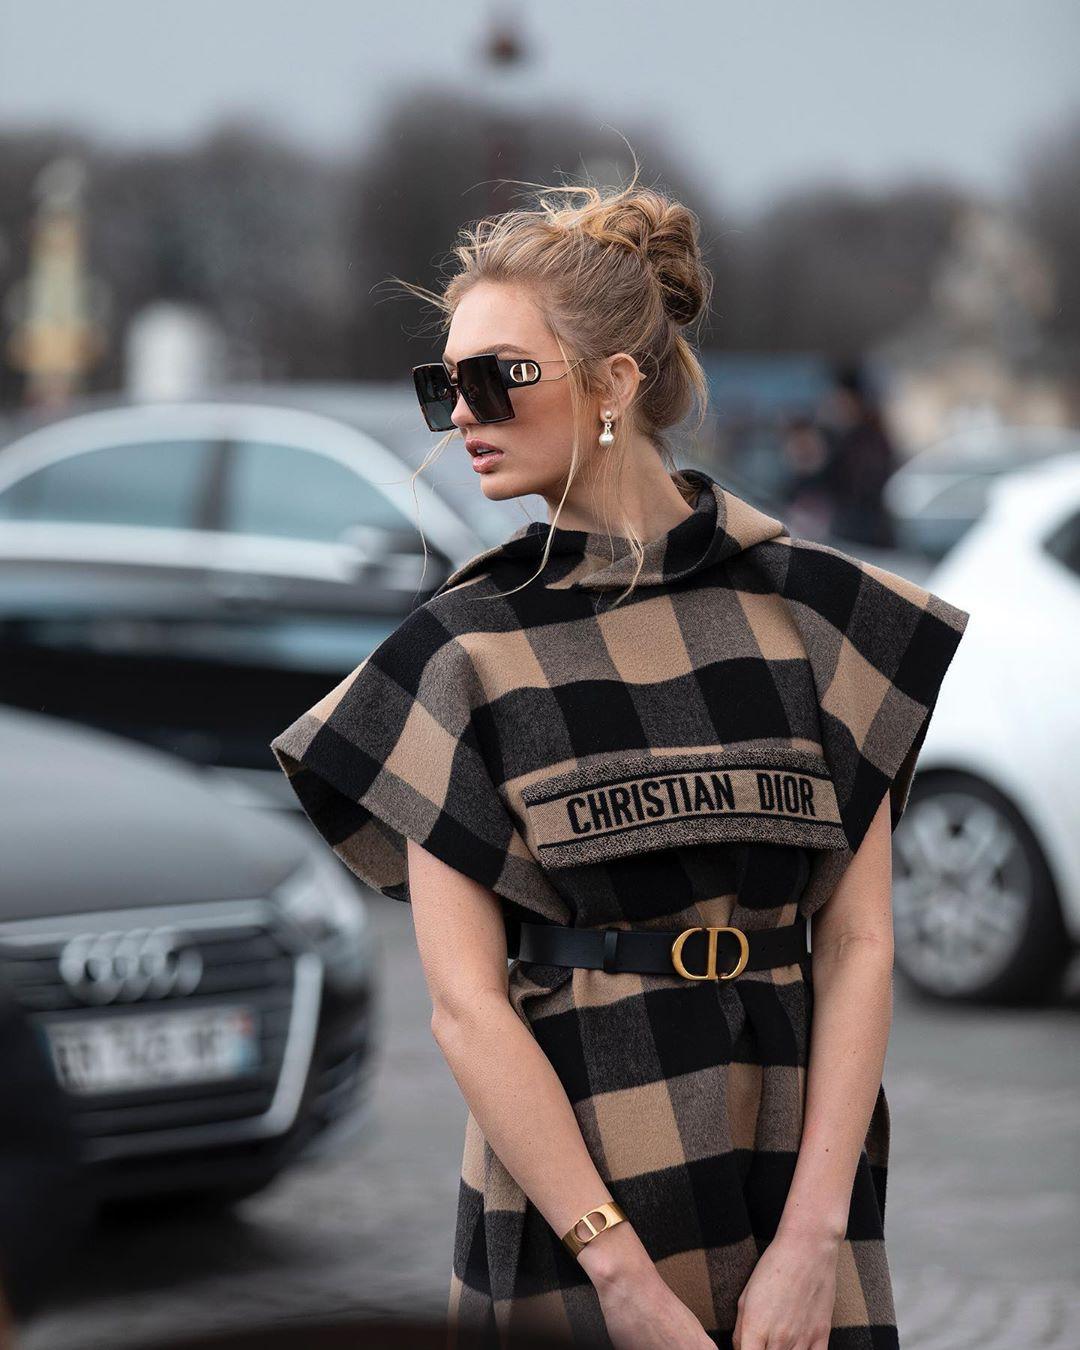 Romee Strijd tartan outfits for girls, eyewear, outfit ideas